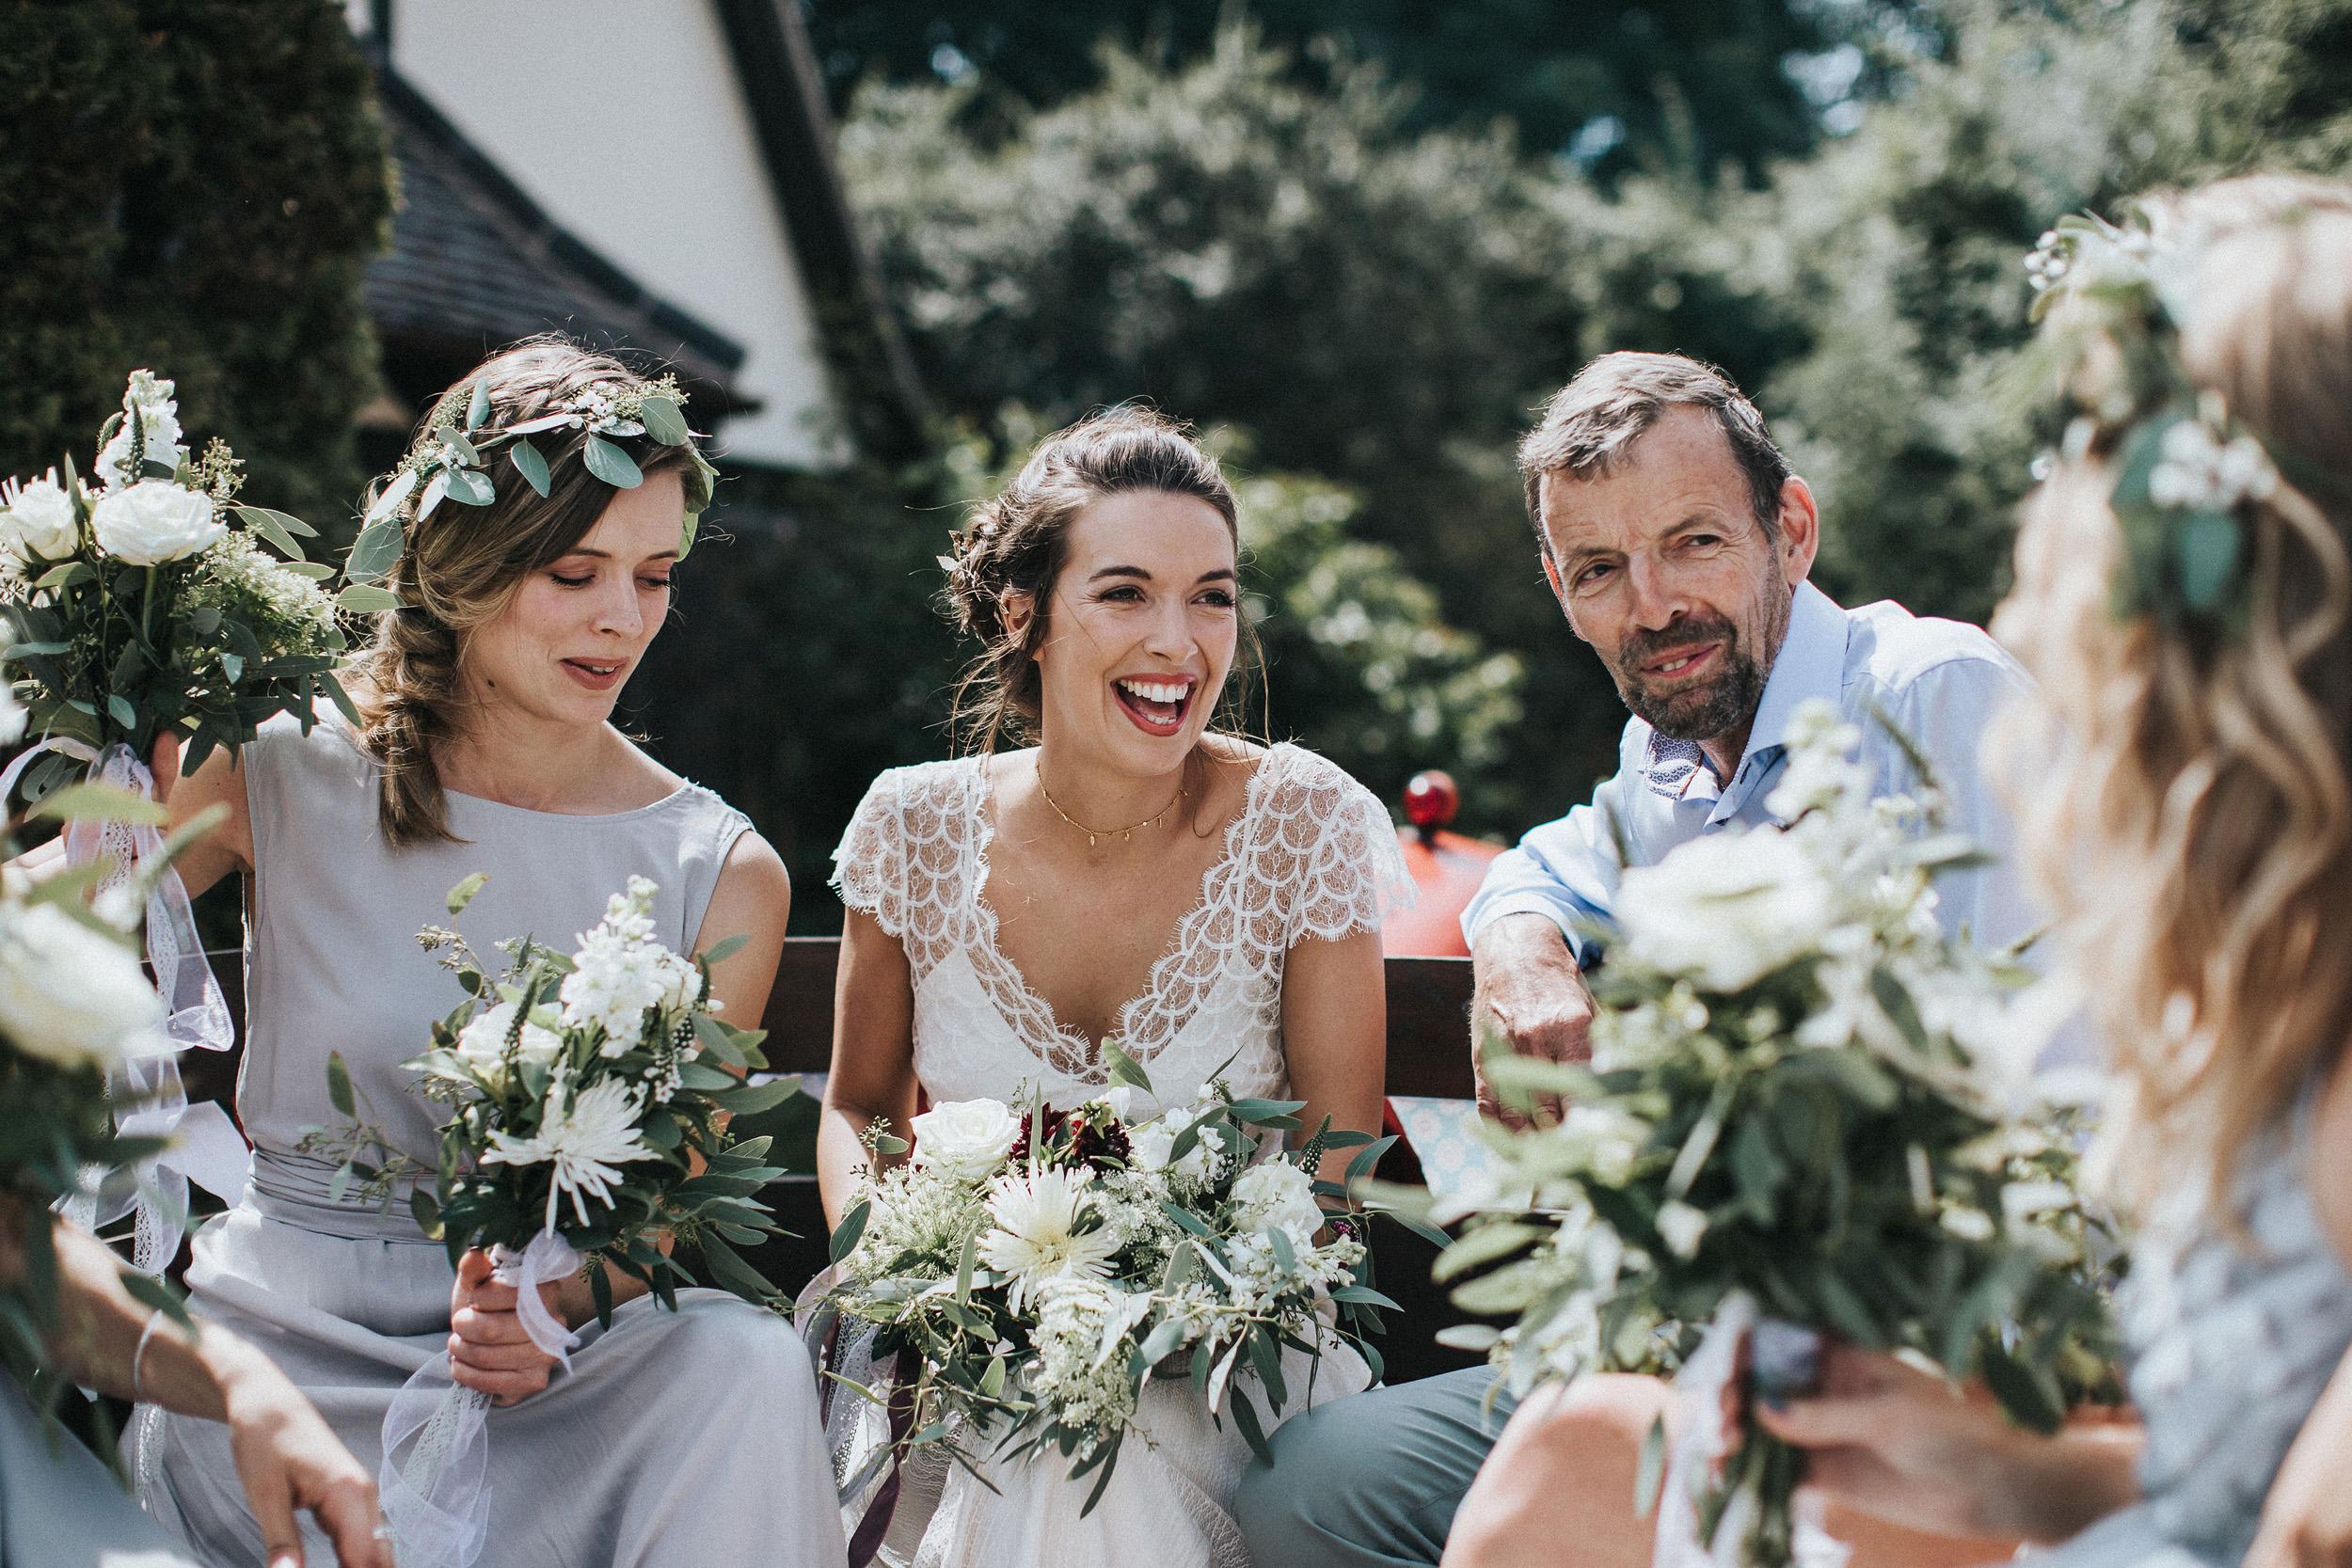 Martha-Laid-Back-Garden-Wedding-Lace-Wedding-Dress-Bohemian-Kate-Beaumont-10.jpg